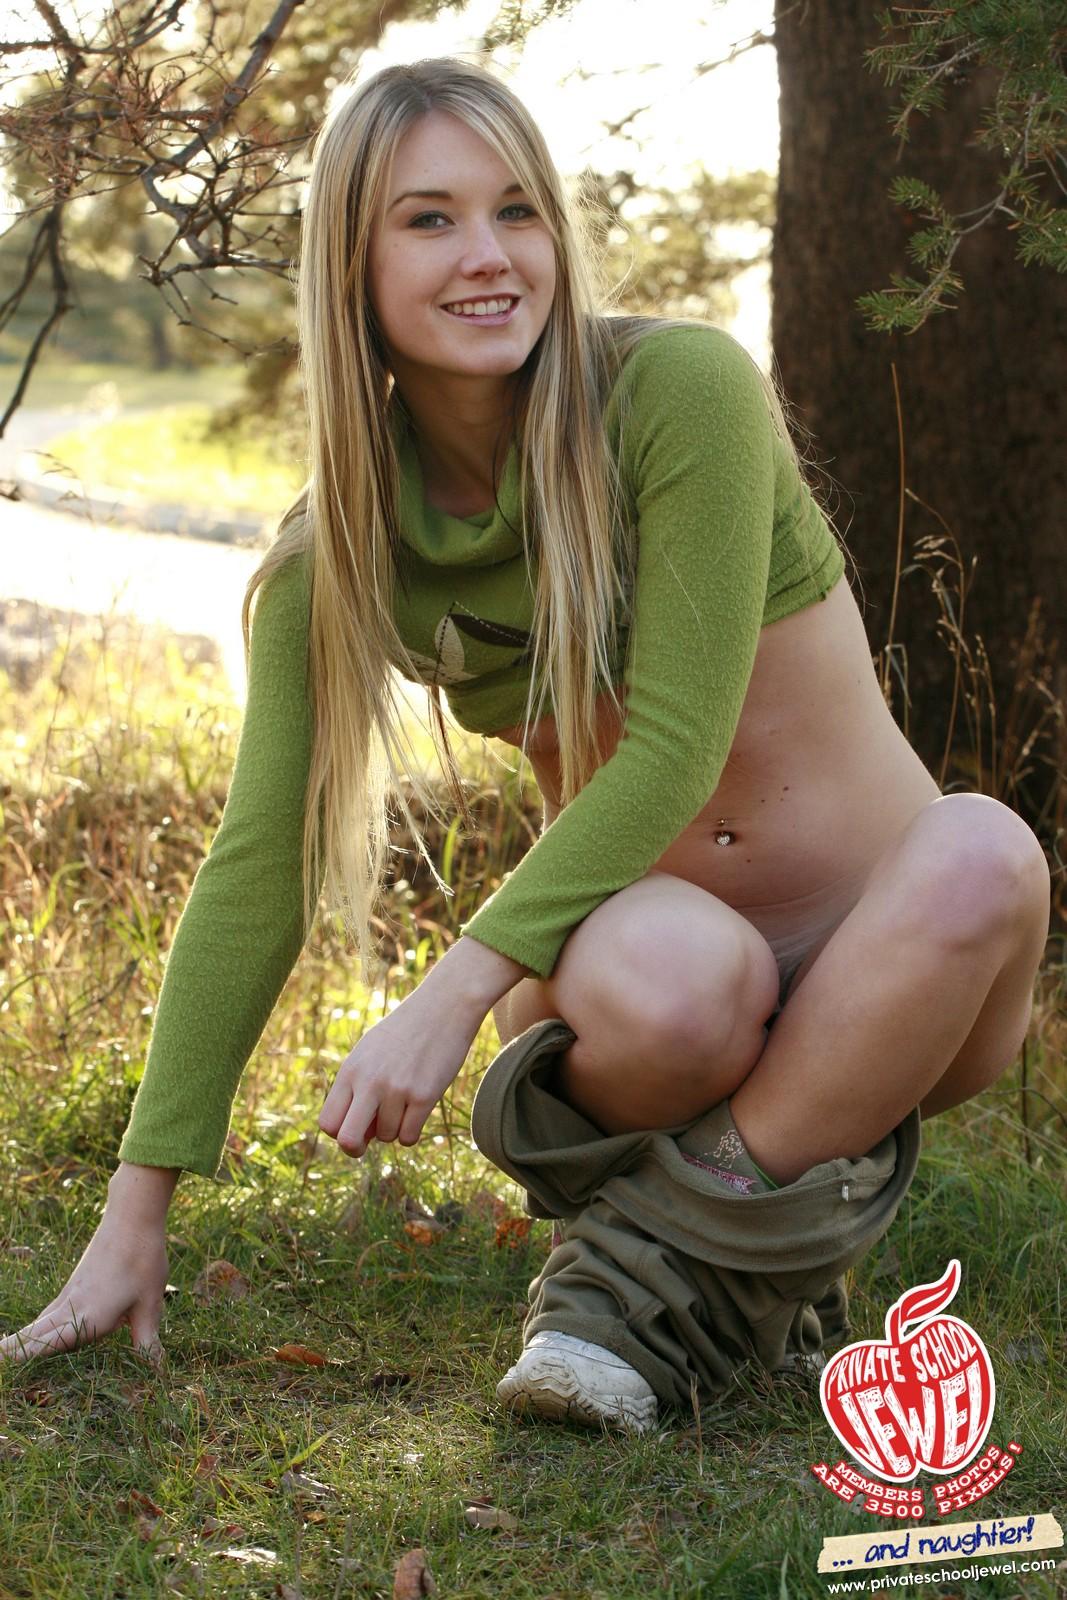 hot young teen ass alanna